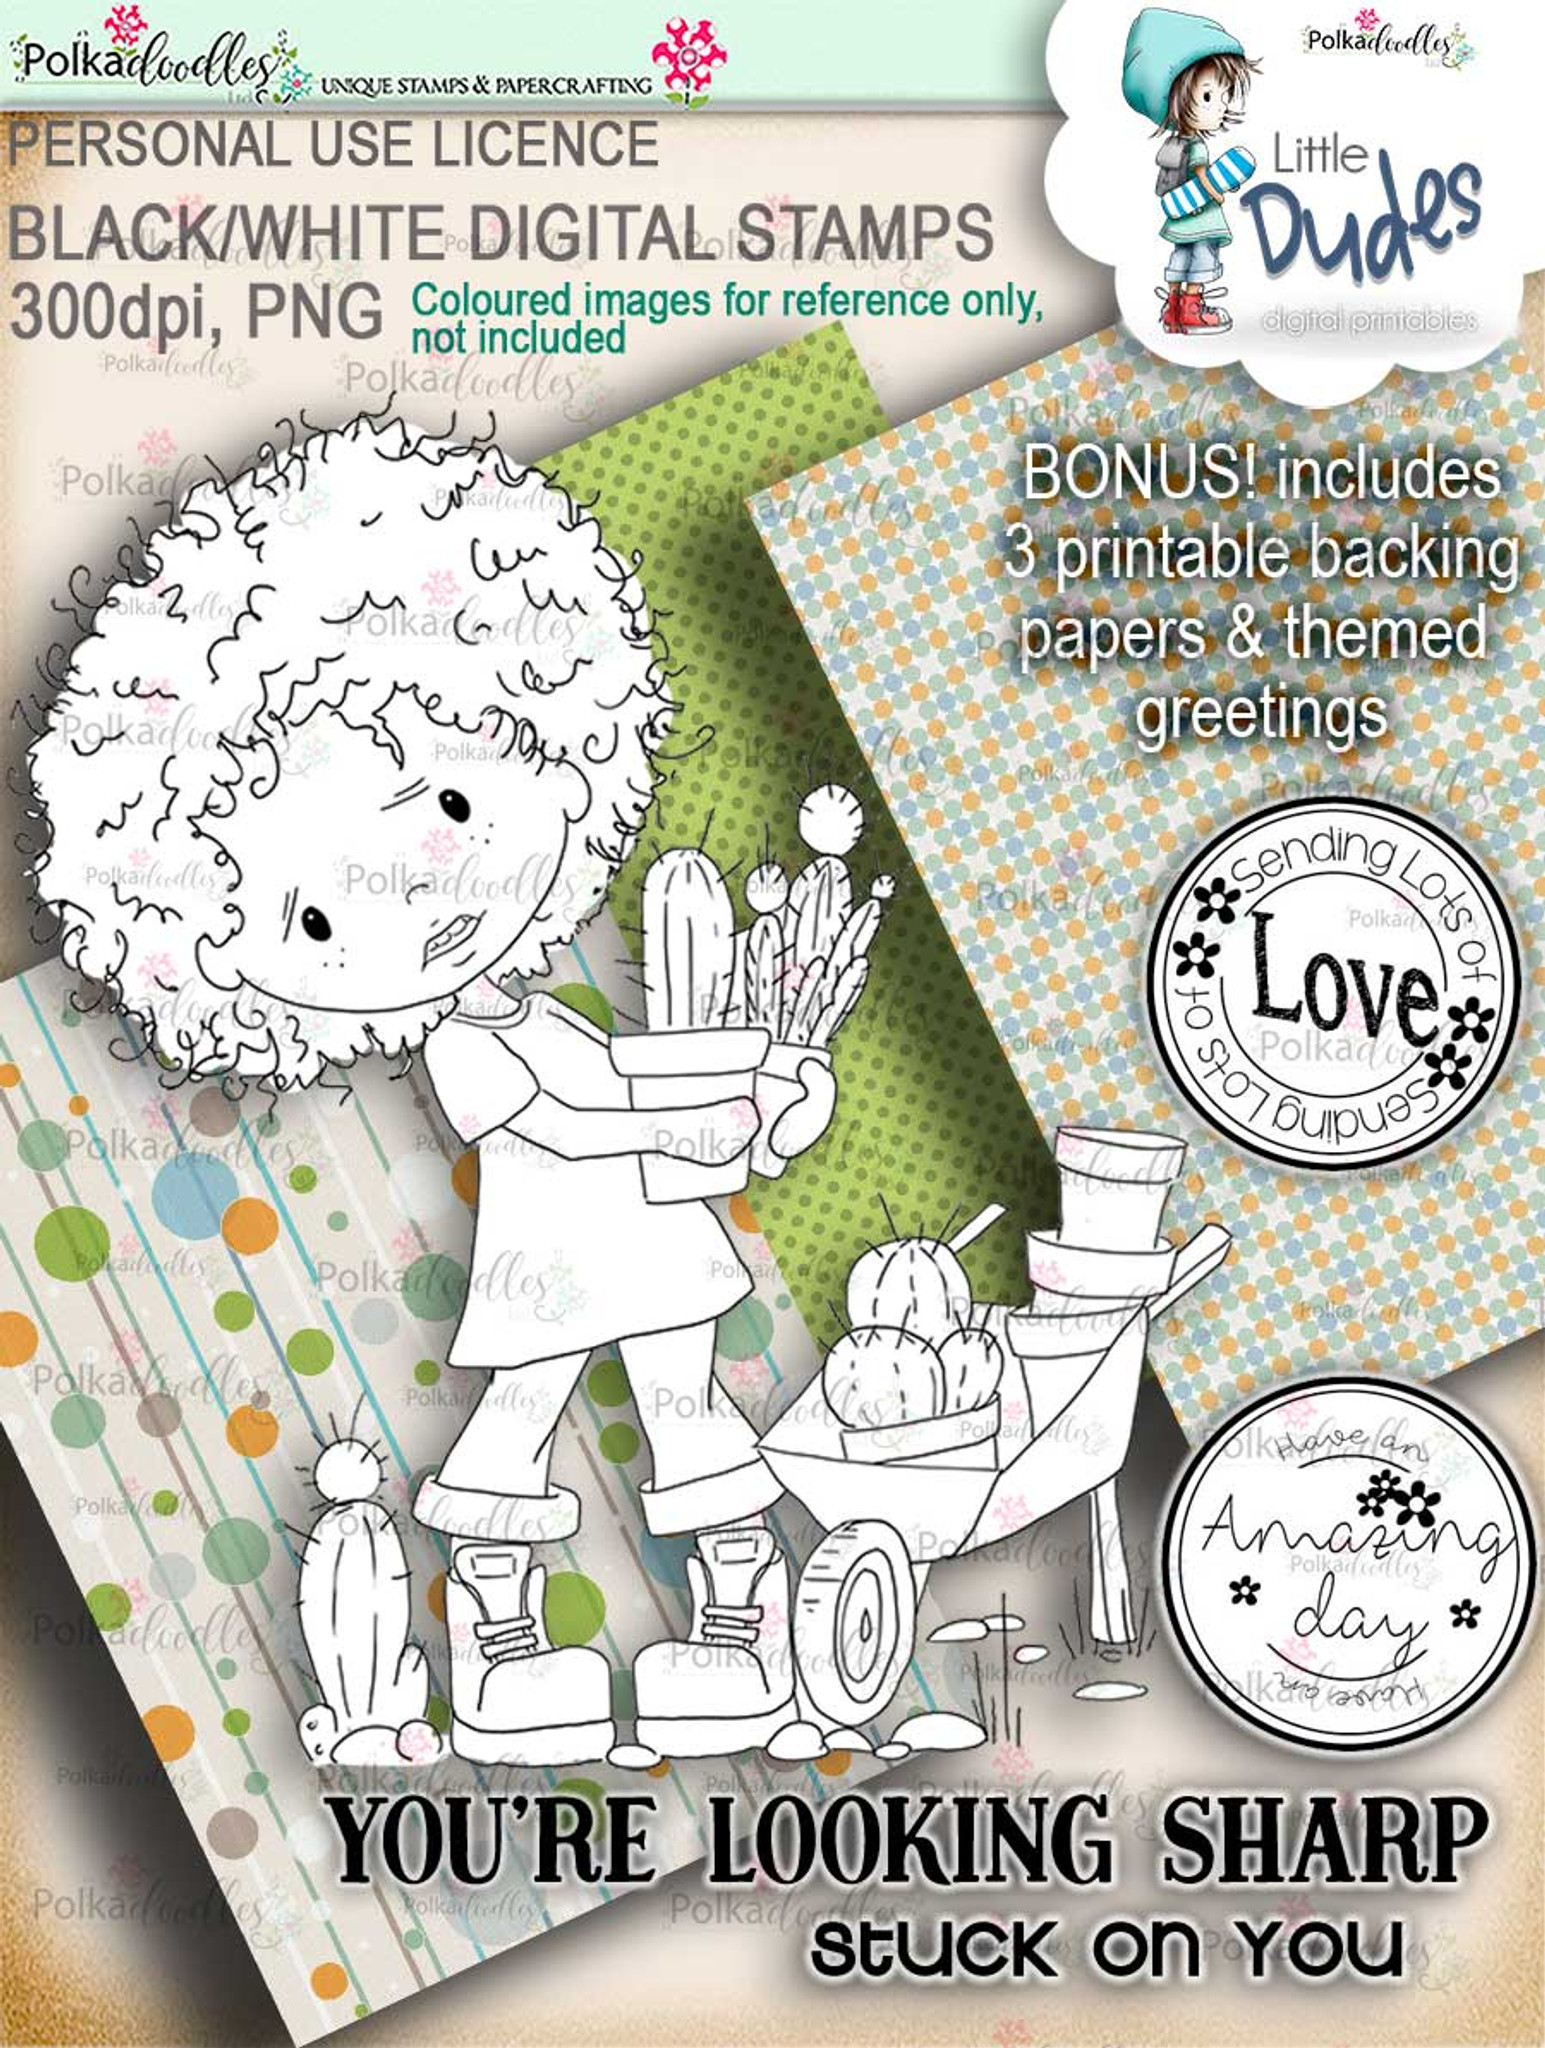 photo relating to Stamp Printable identify Prickly Tiny Male - Minimal Dudes digi stamp printable obtain